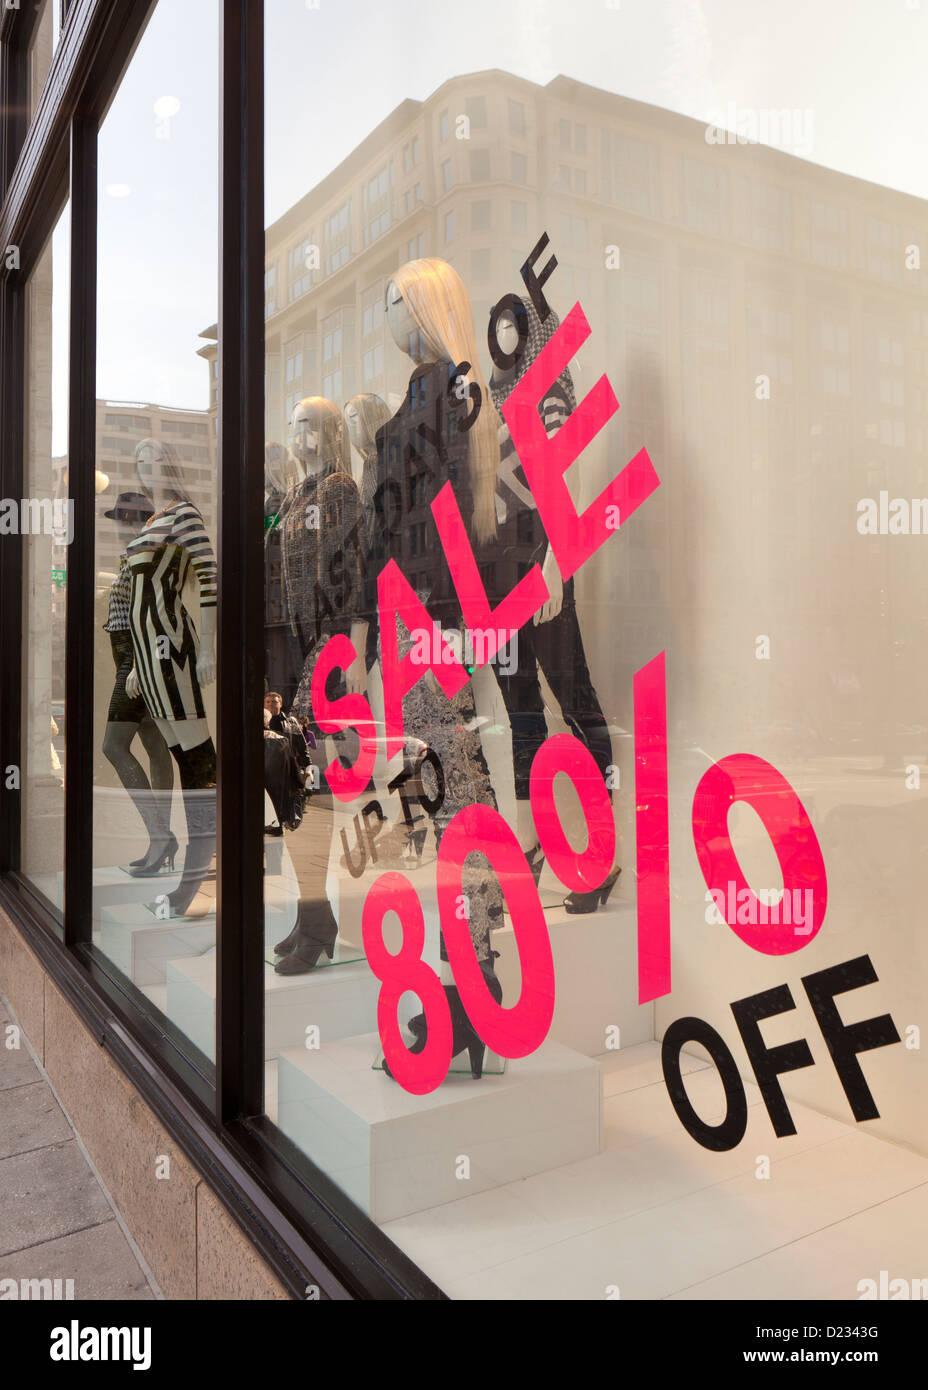 80% off sale sign on clothing store window display - Washington, DC USA - Stock Image